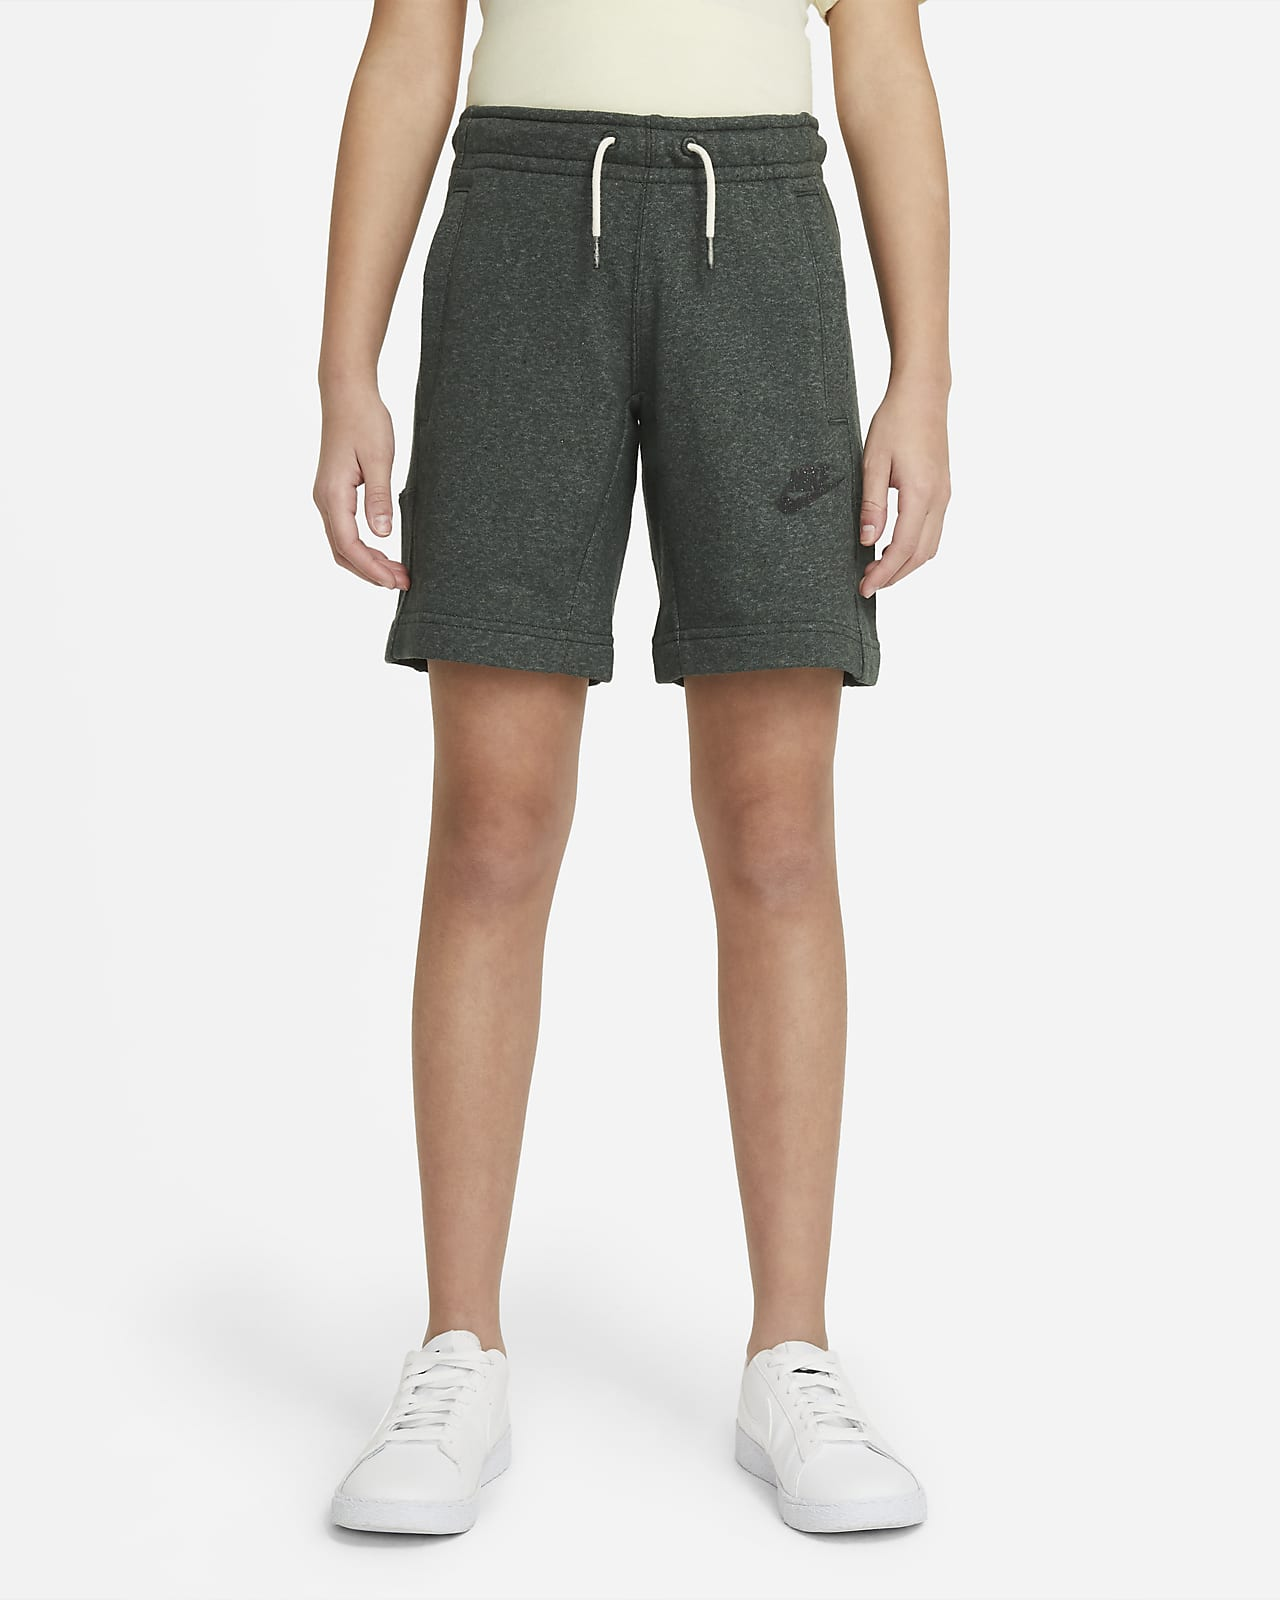 Nike Sportswear Big Kids' Shorts